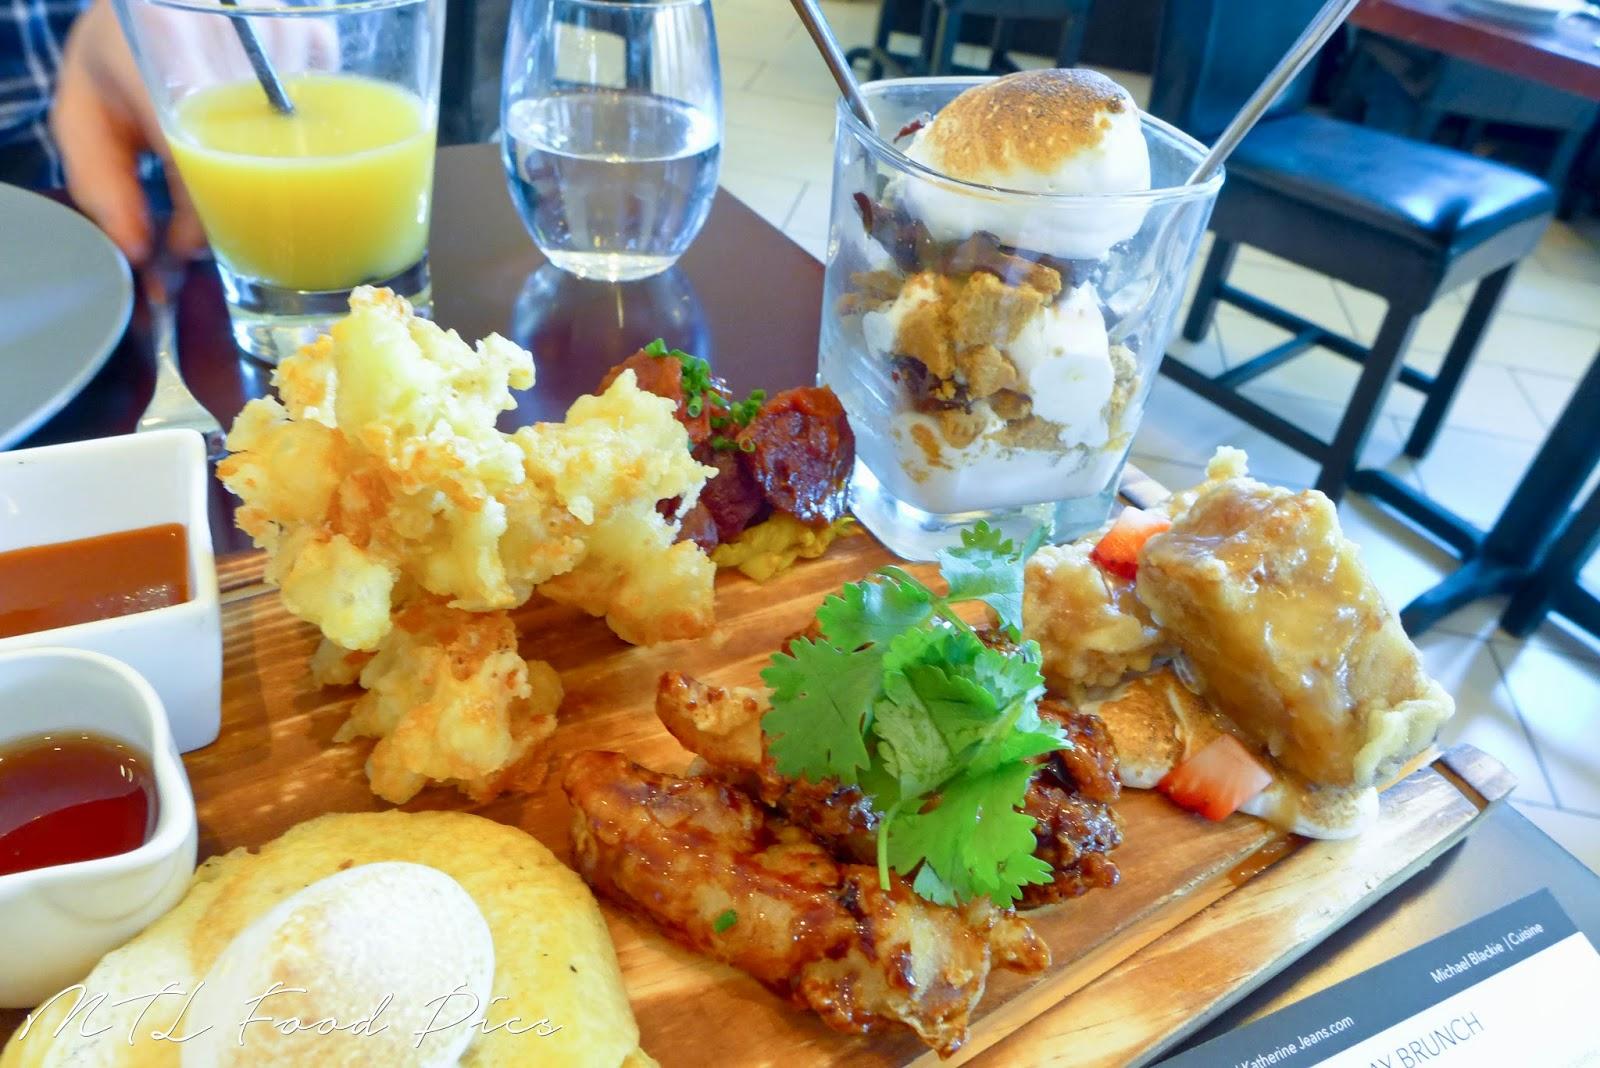 Next Restaurant - Bread Pudding, Currywurst, S'mores Ottawa